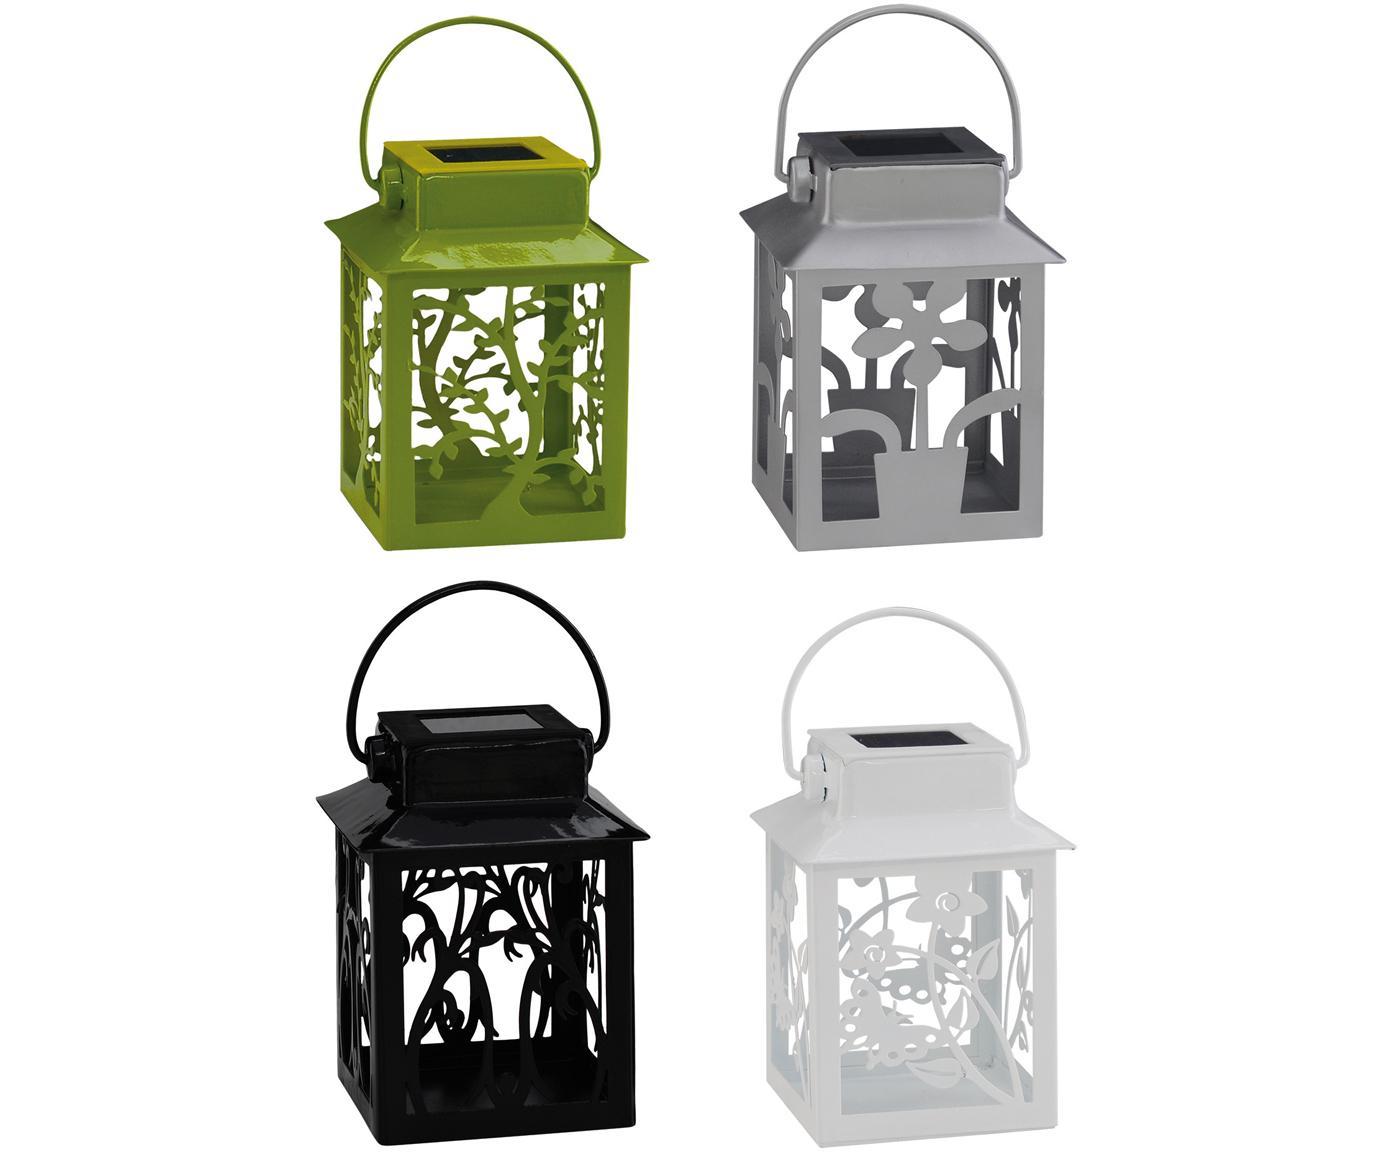 Set 4 lanterne solari a LED Garden-Lantern, Metallo, materiale sintetico, Multicolore, Larg. 8 x Alt. 13 cm